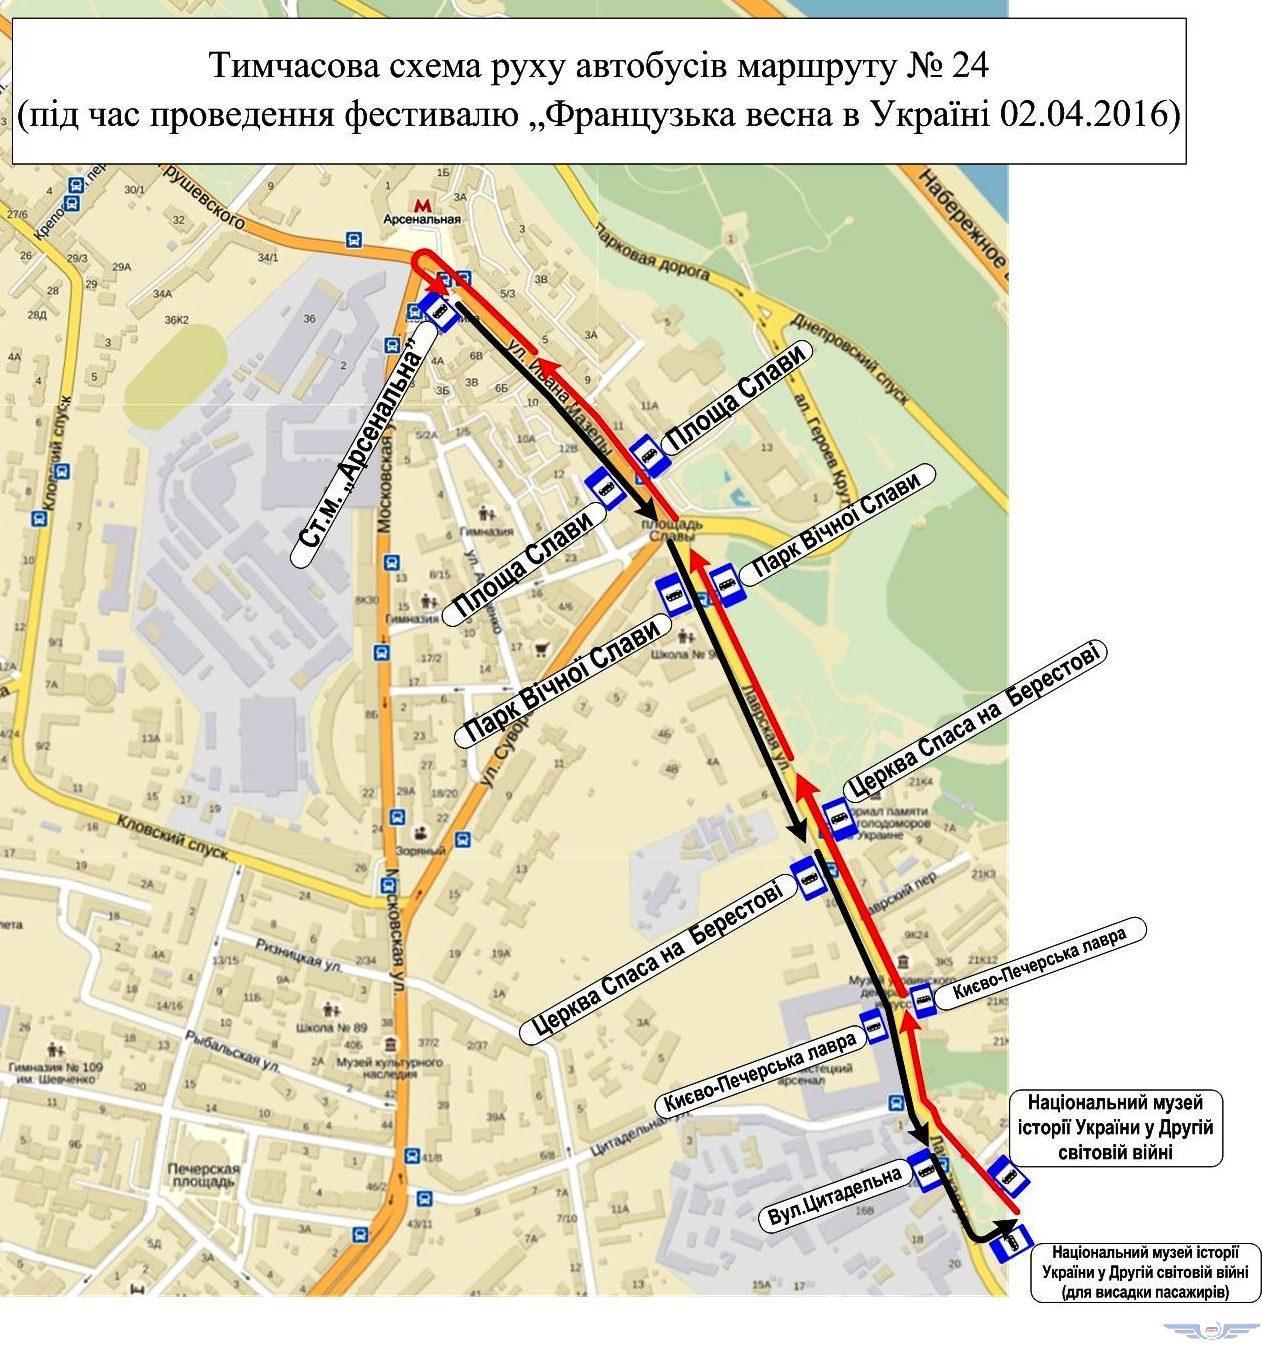 маршрута 102 схема автобуса